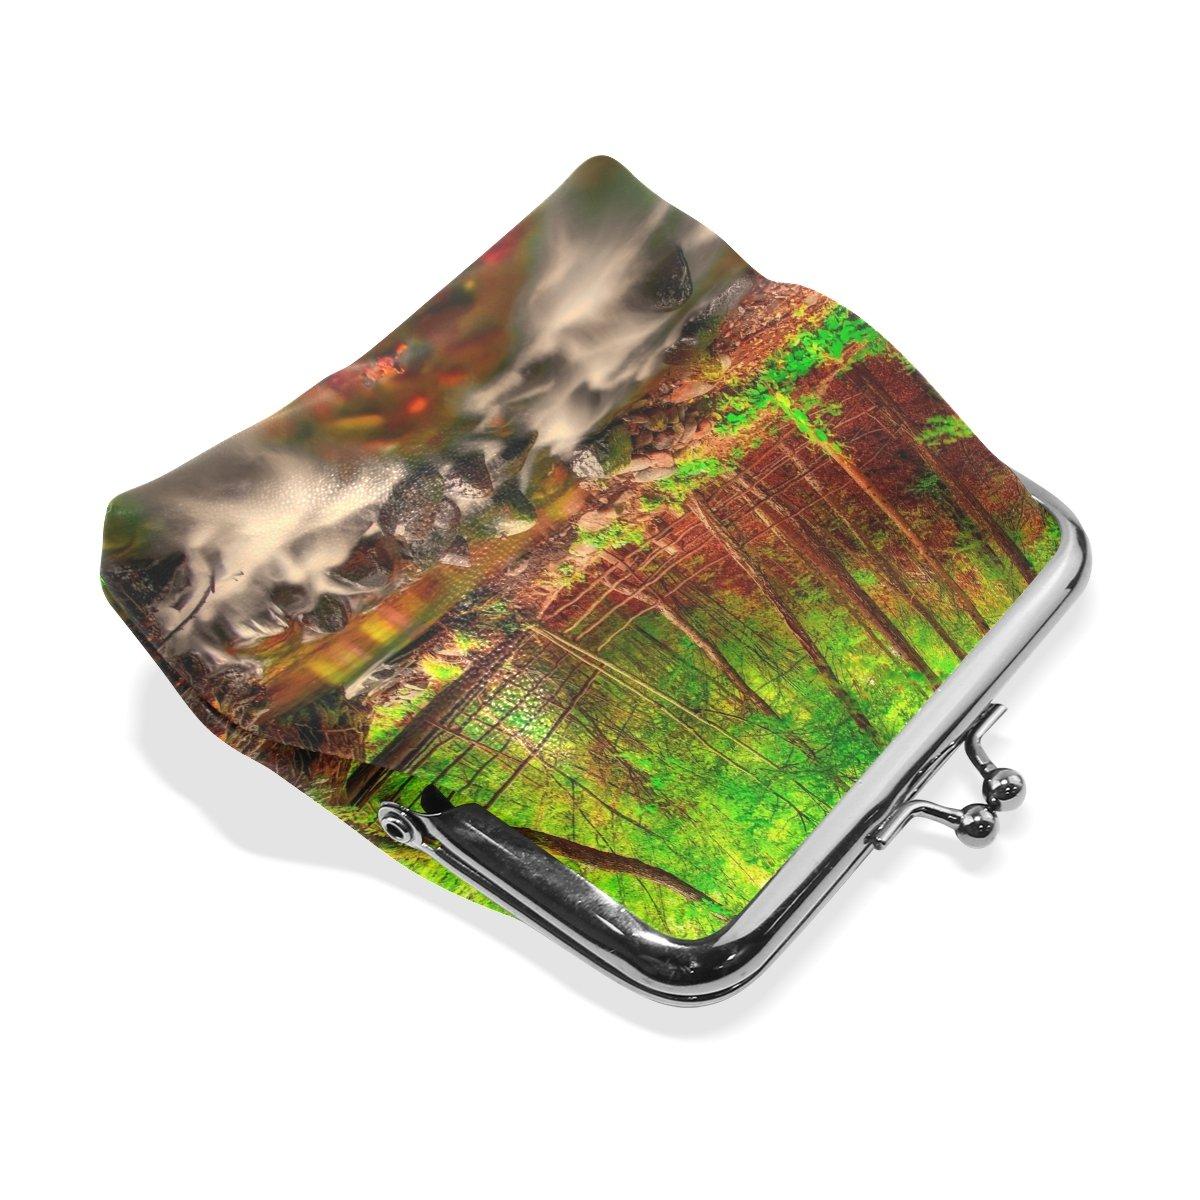 Coin Purse Landscape Forest Wallet Buckle Clutch Handbag For Women Girls Gift